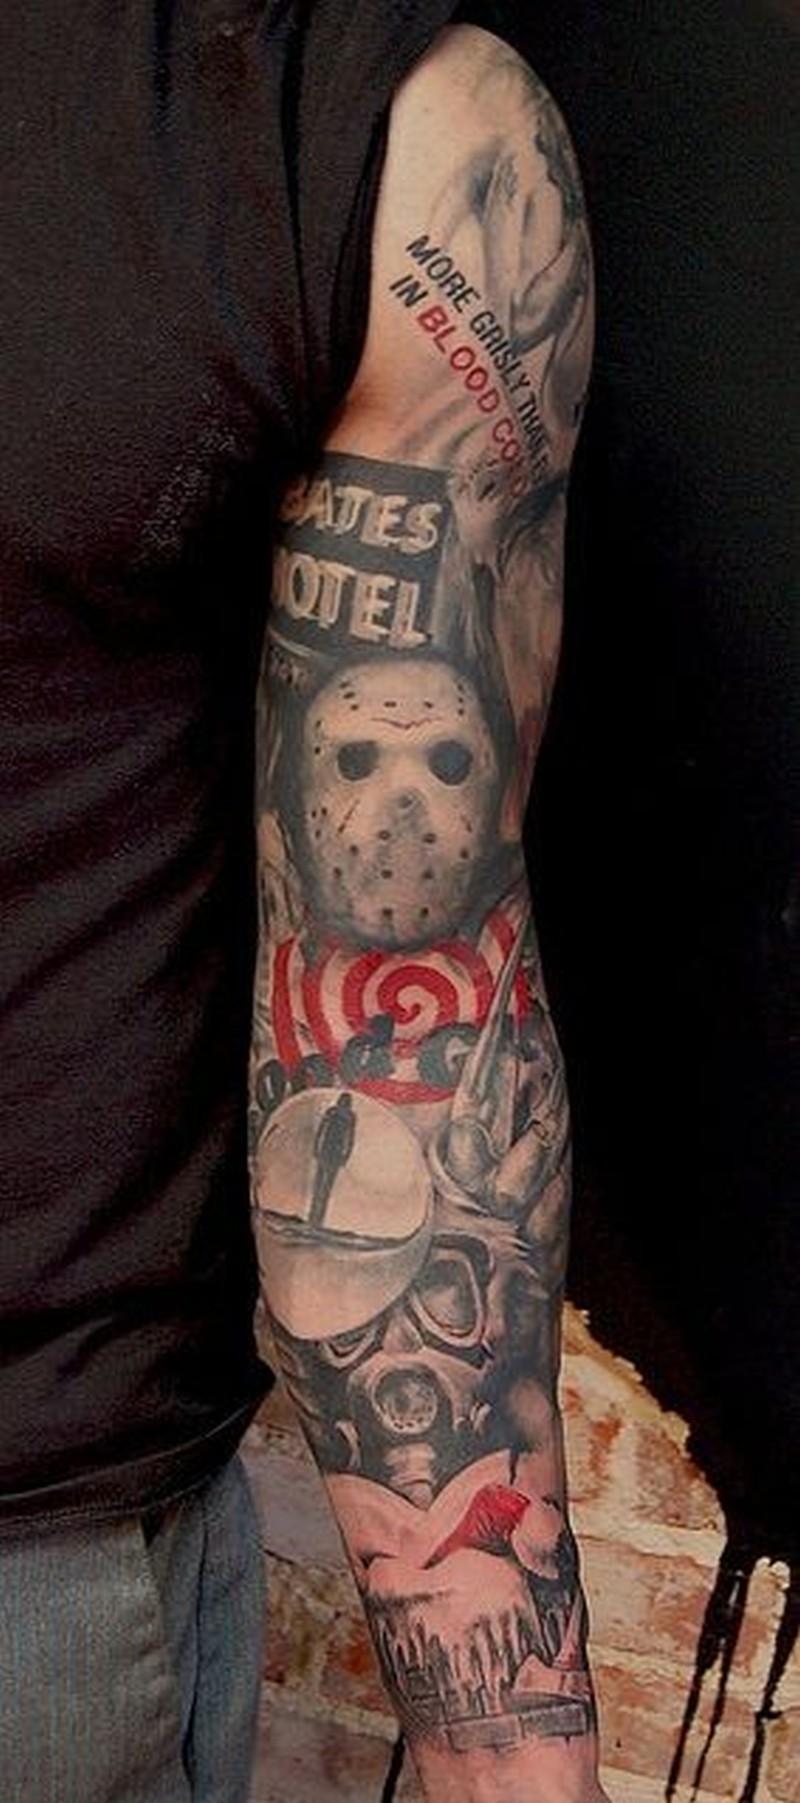 Friday the 13 movie horror tattoo on arm